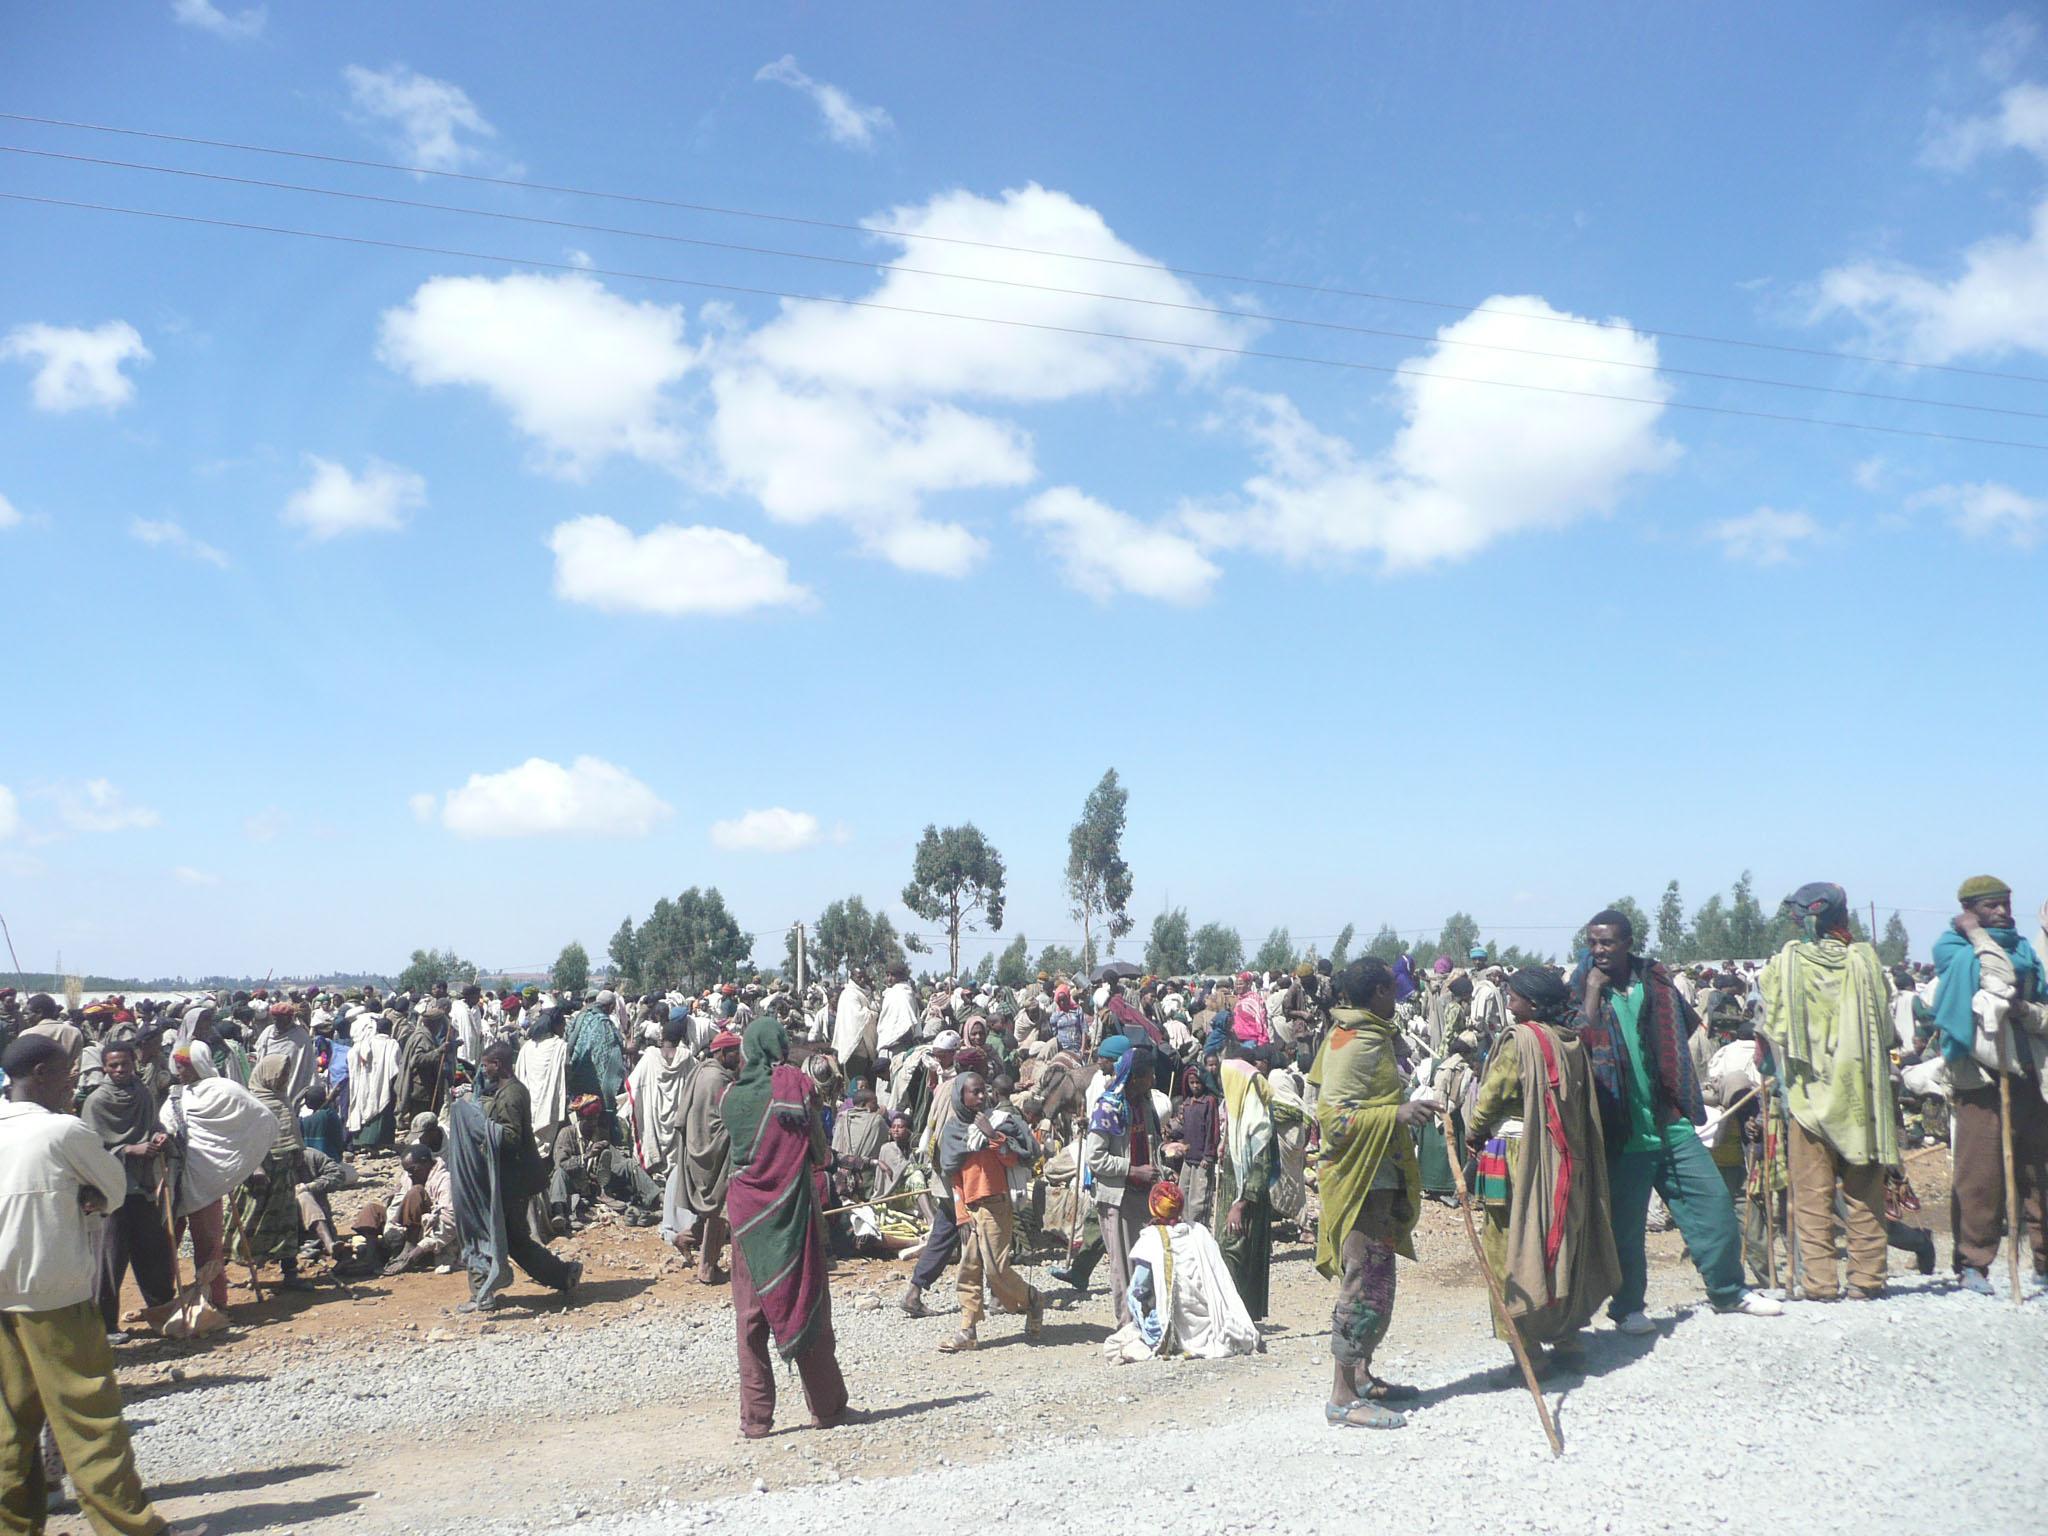 Veduta di un mercato in Etiopia